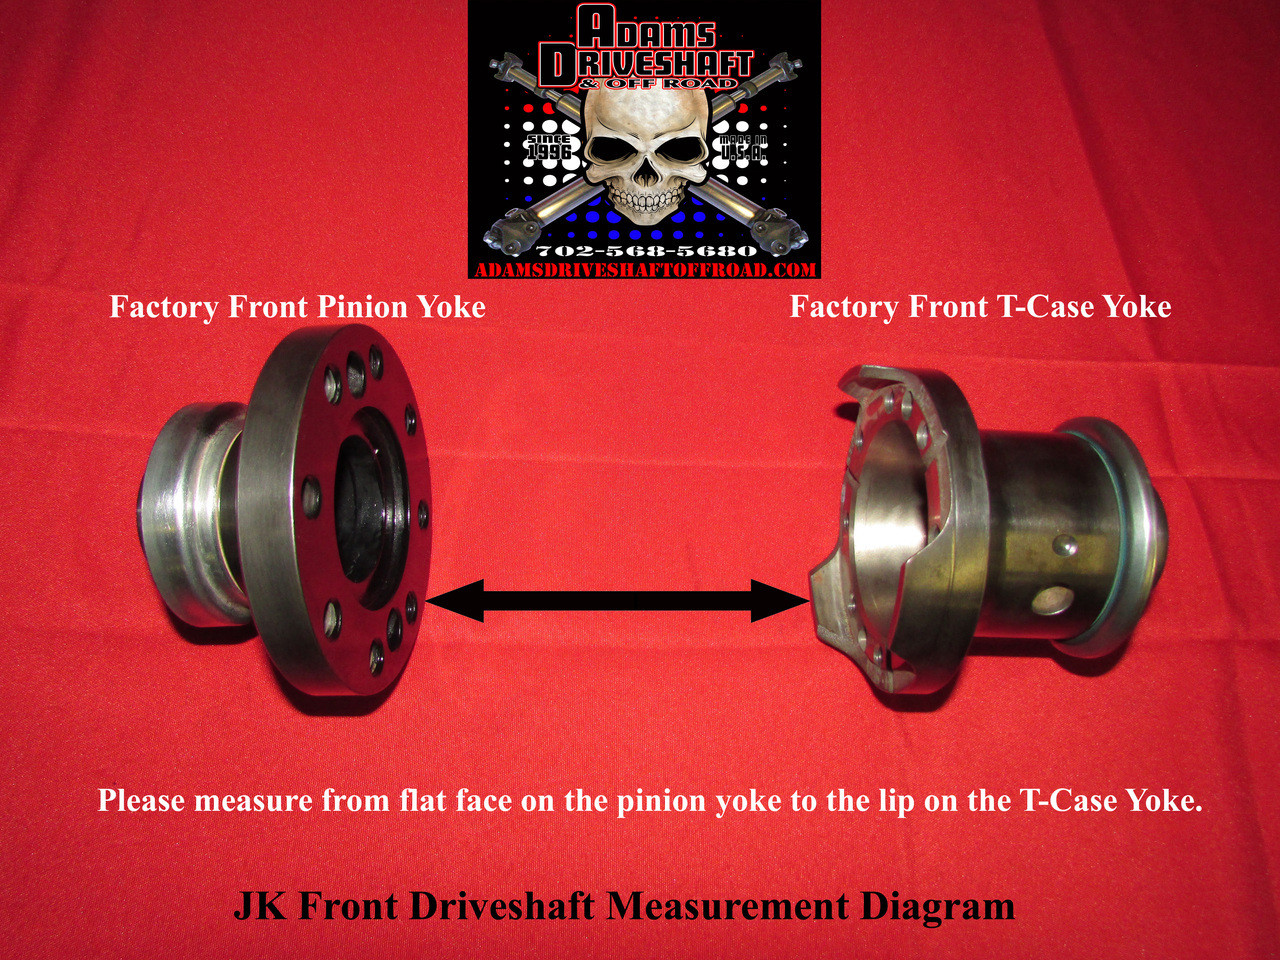 Adams Driveshaft 1350 Front Rock Crawler CV Driveshaft (Wrangler JK 2007+)